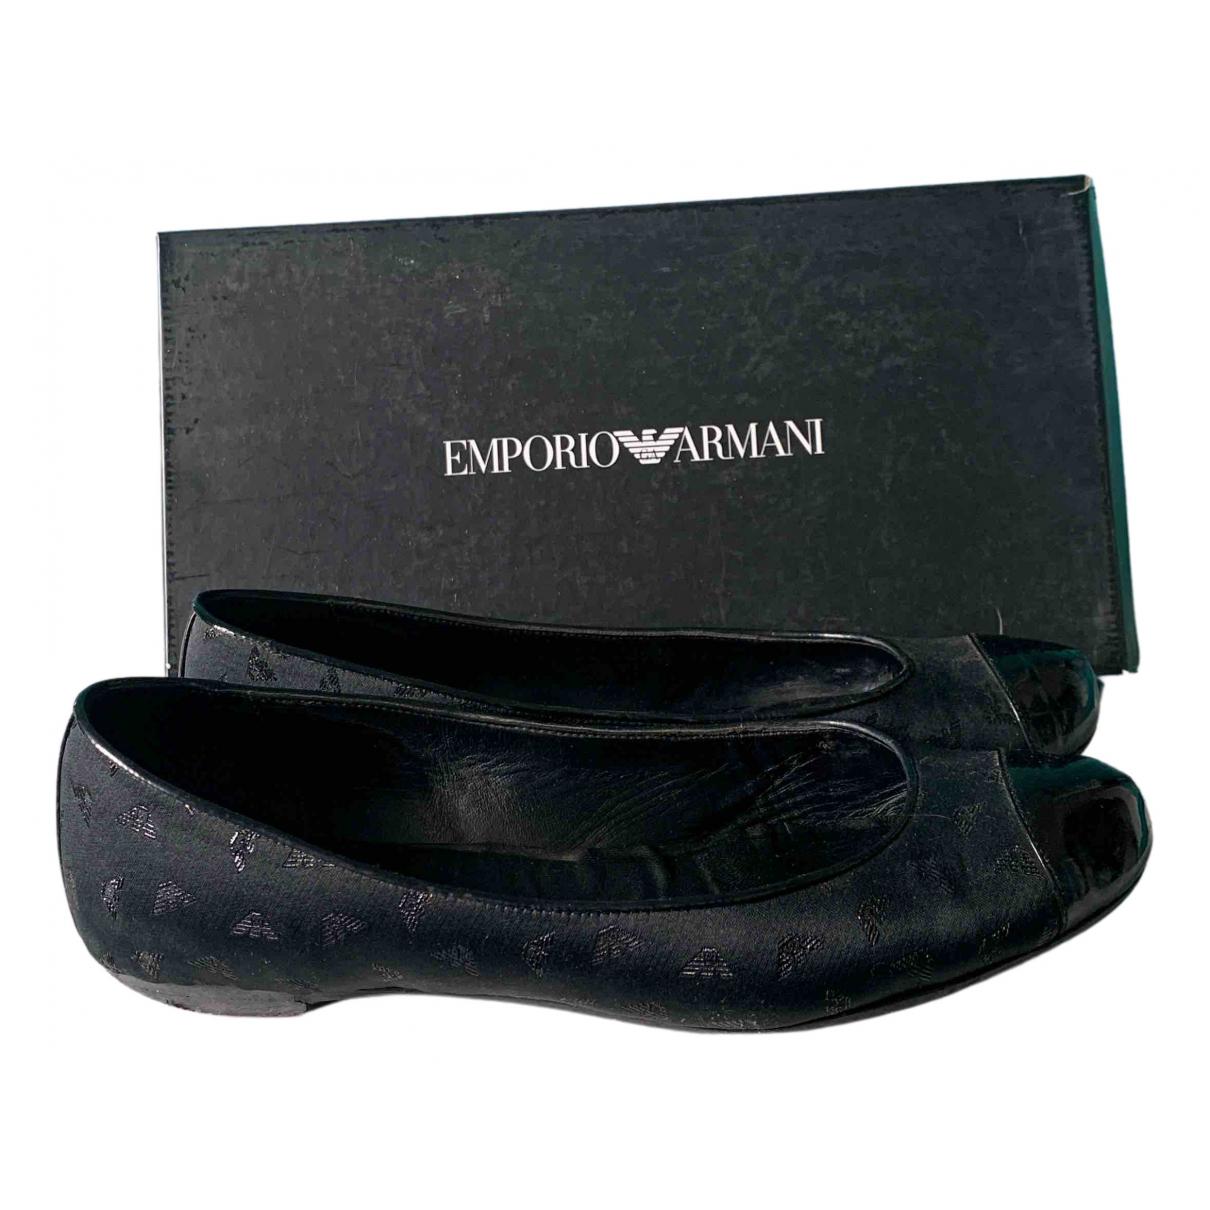 Emporio Armani - Ballerines   pour femme en toile - noir